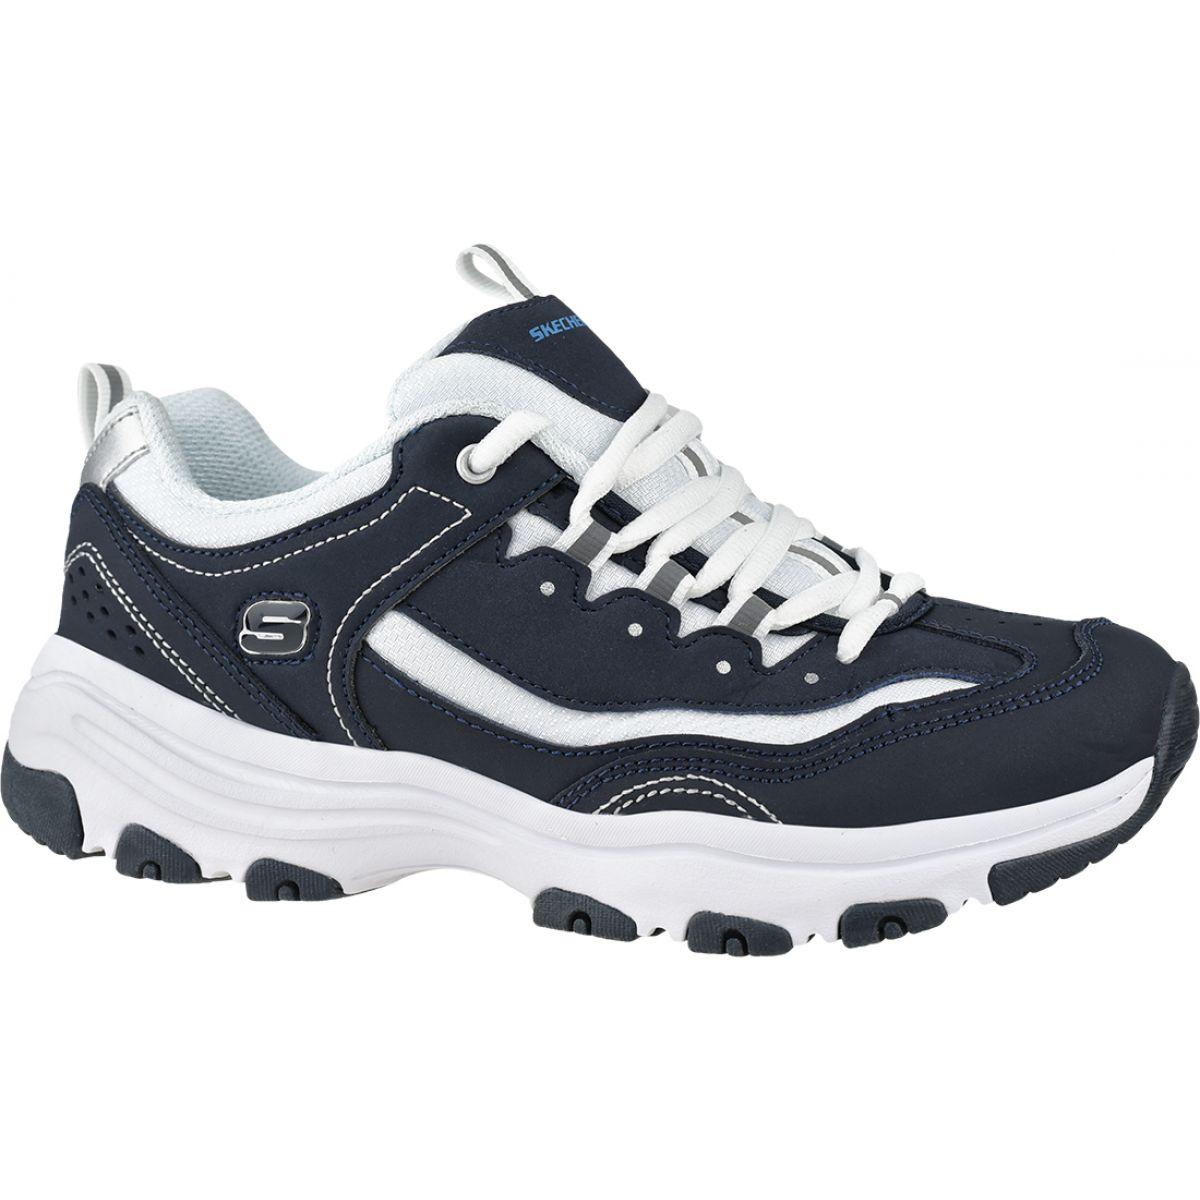 Skechers D\'Lites - Bleu